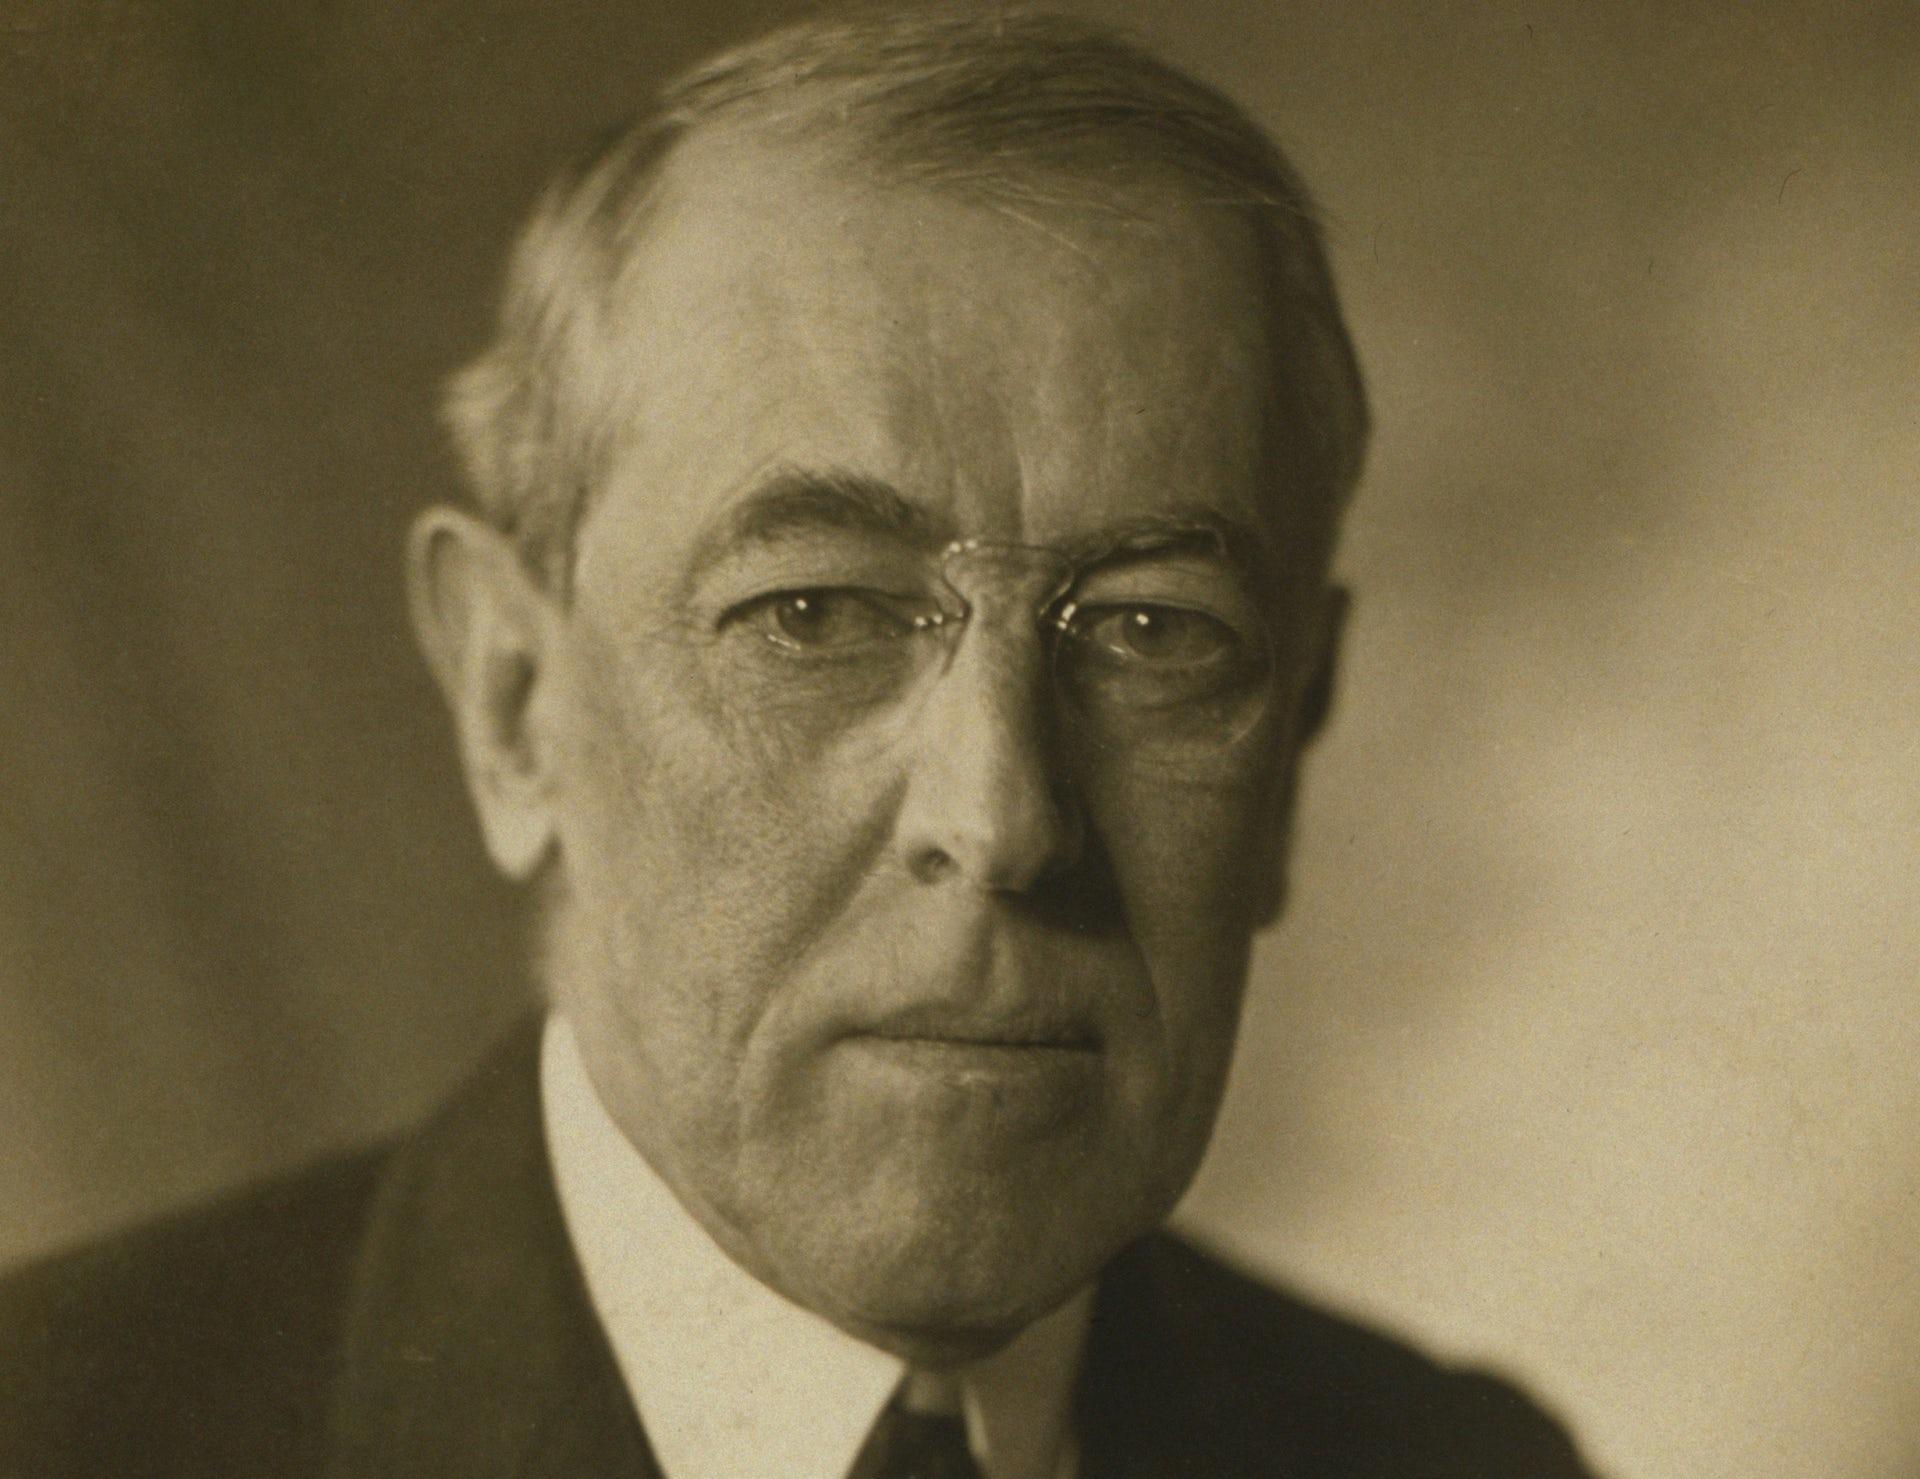 Woodrow Wilson's famous US speech makes a mockery of Donald Trump